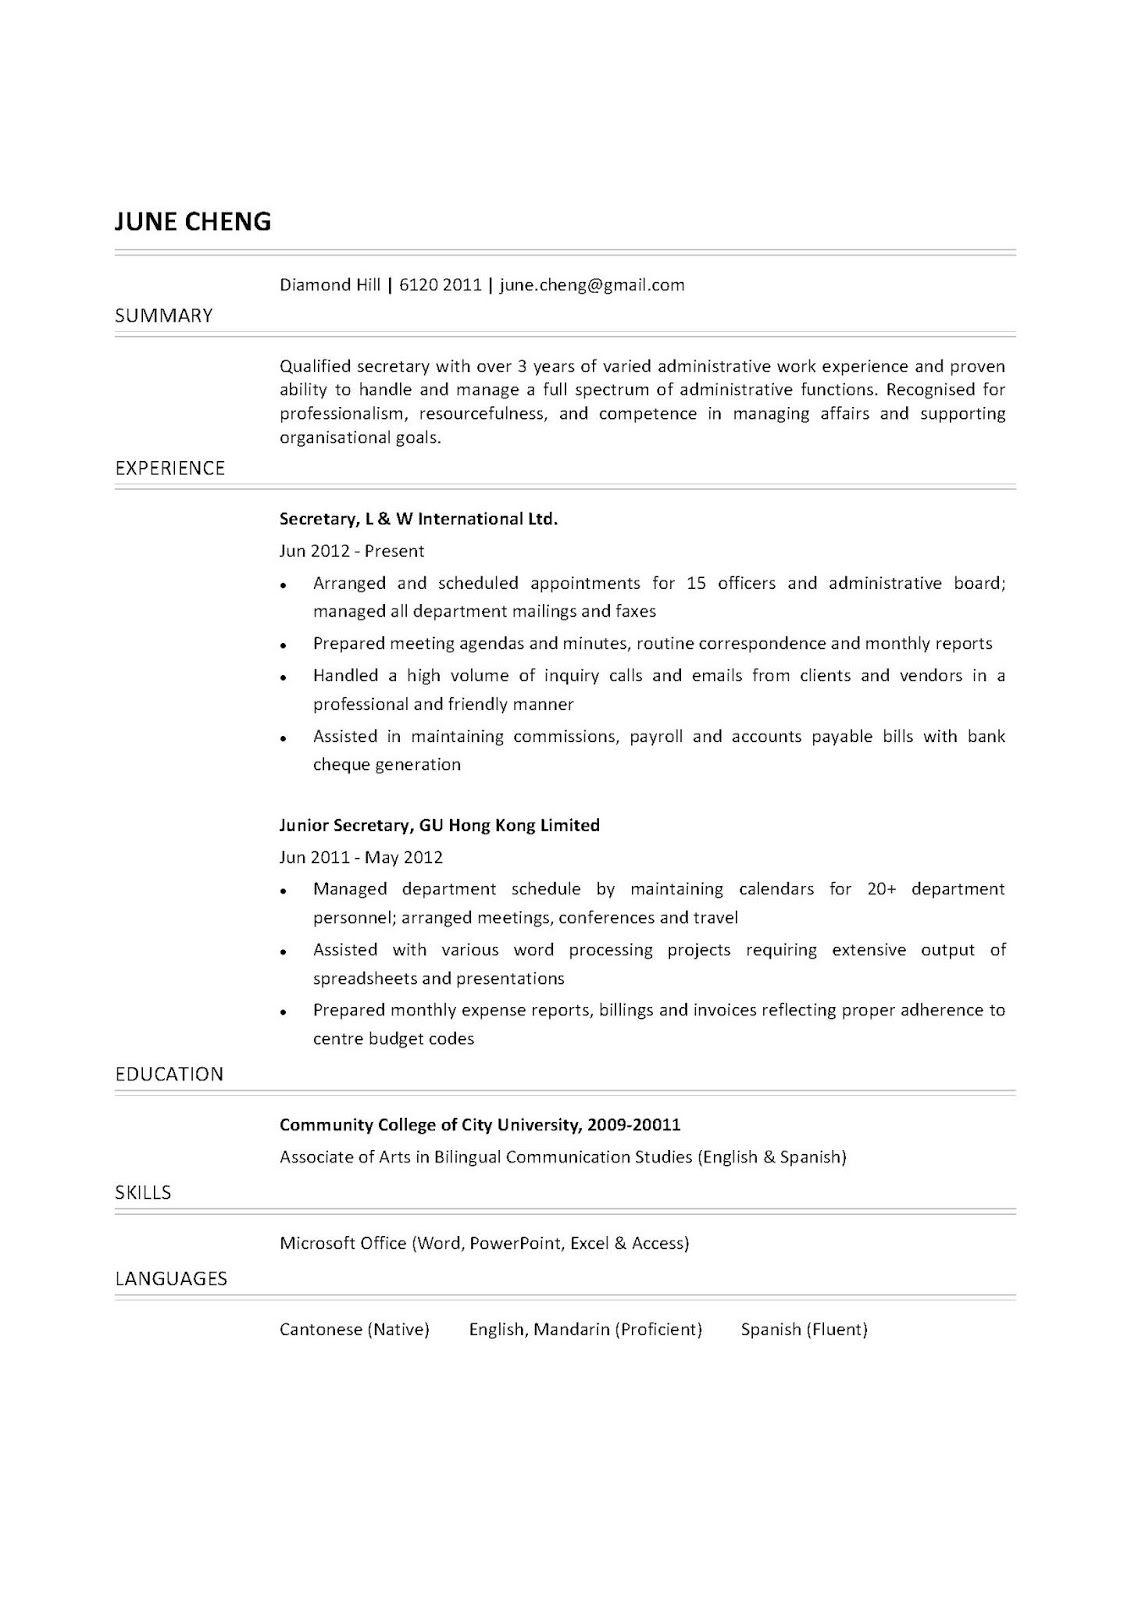 Secretary Resume Examples Secretary Resume Examples 2019 Secretary Resume Examples 2020 Secretary R Job Resume Examples Resignation Template Resume Examples